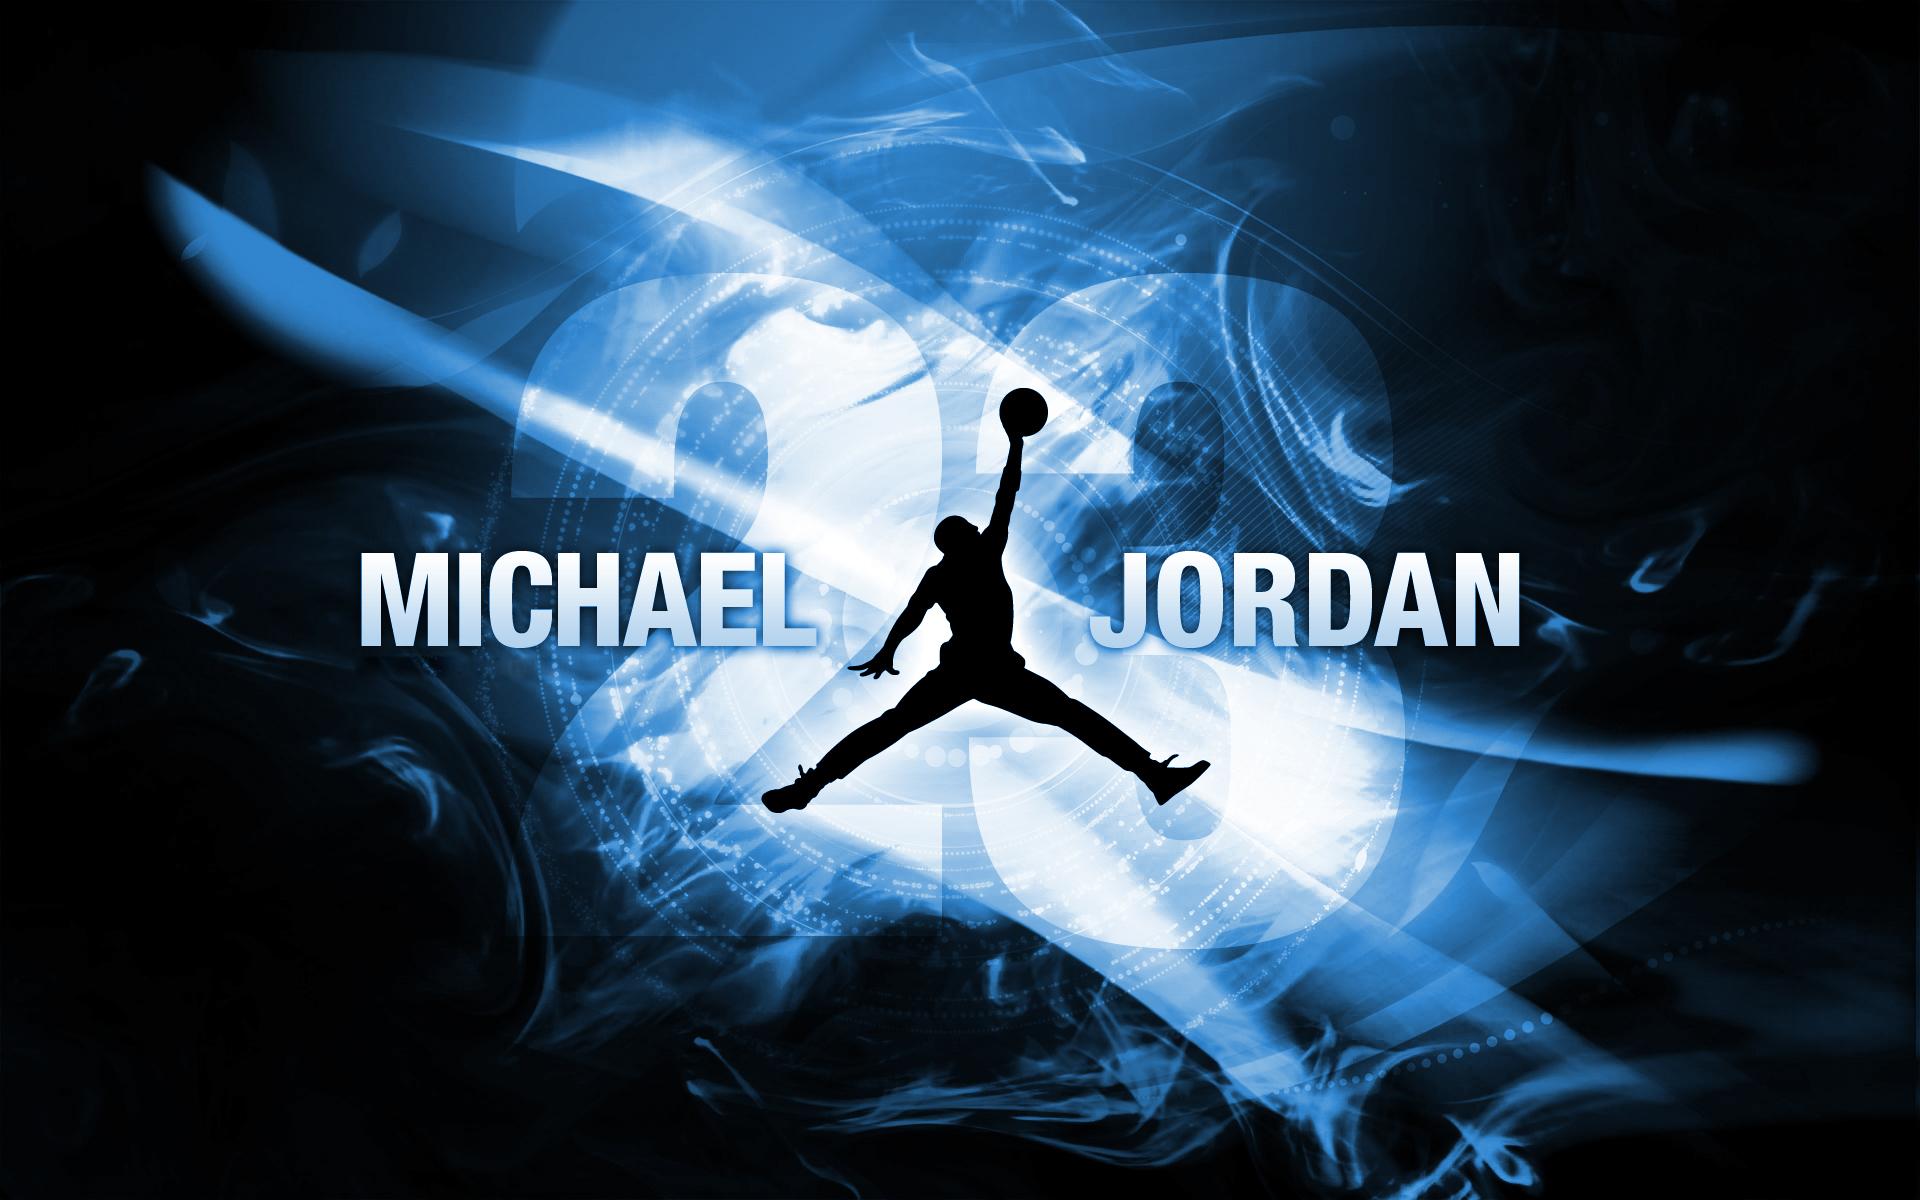 Michael Jordan Wallpaper 6 Wallpapers Photo 1920x1200